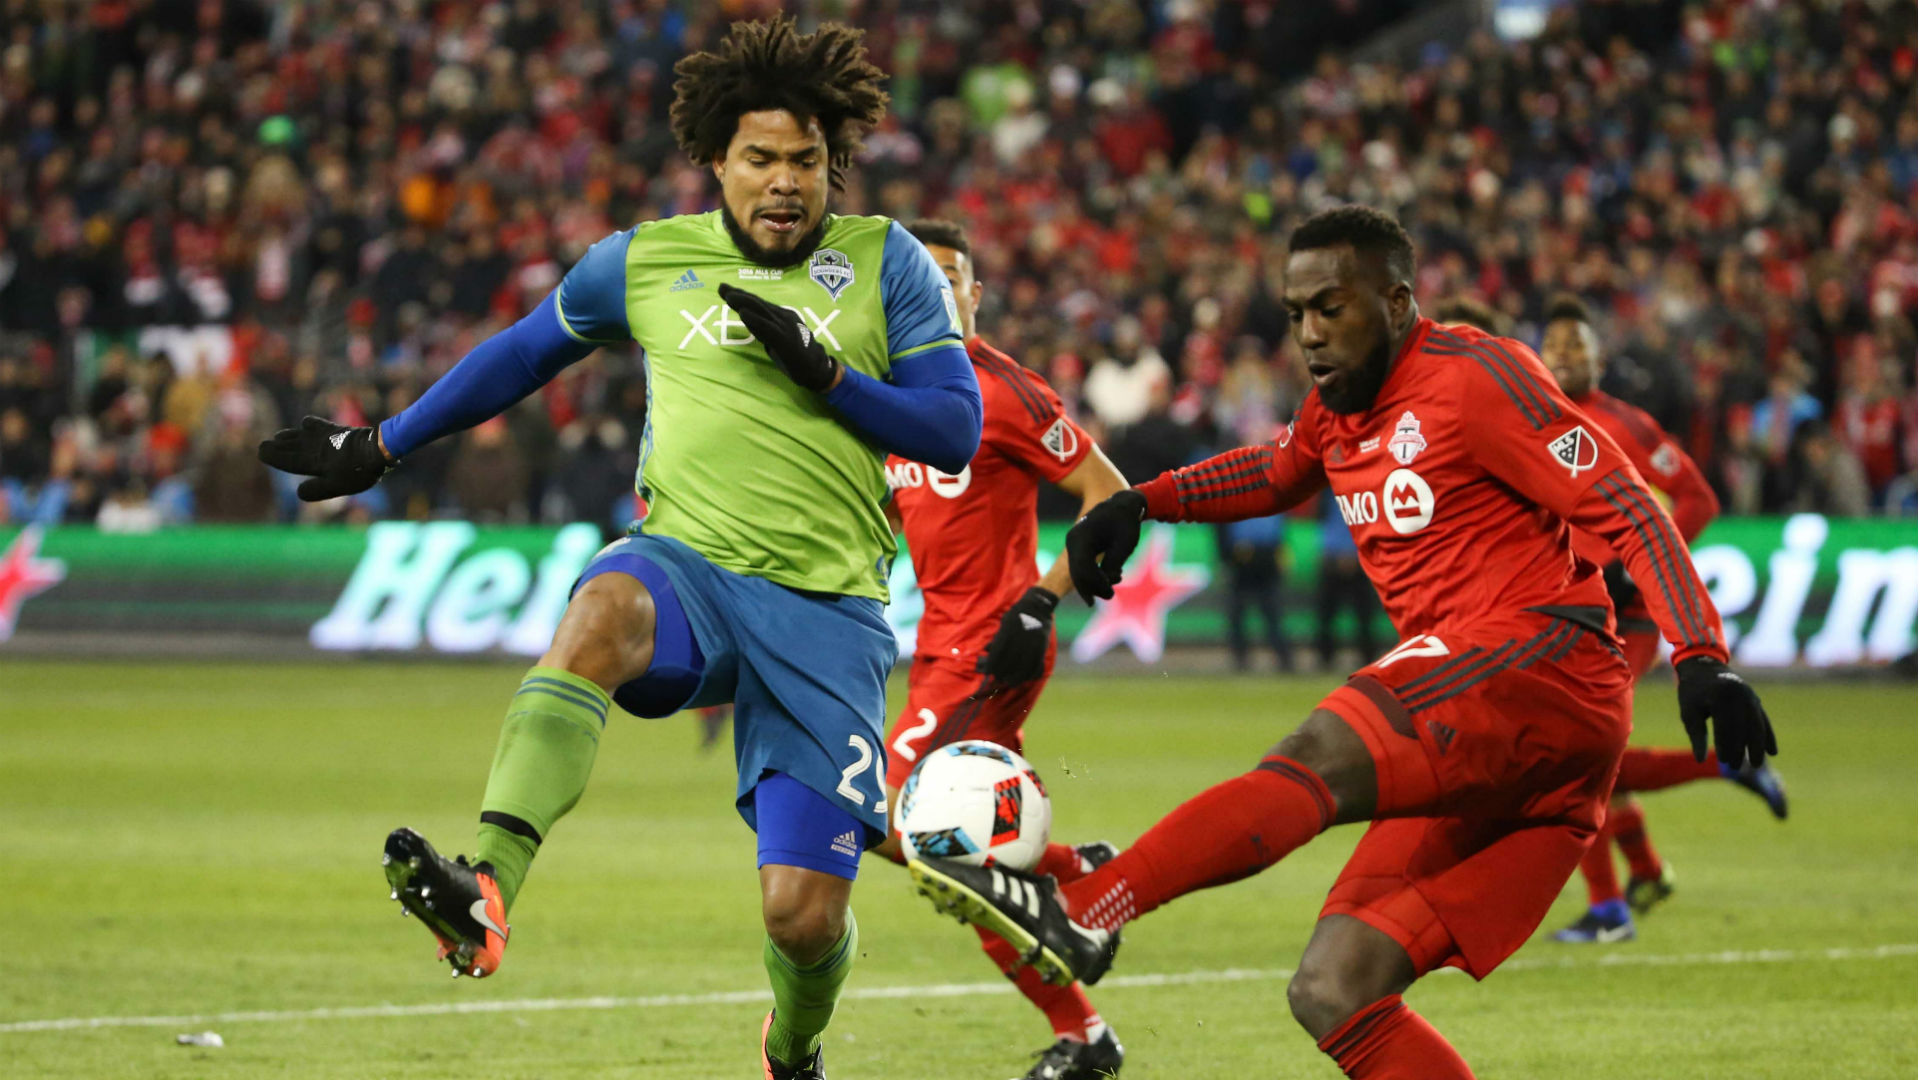 Roman Torres Jozy Altidore Seattle Sounders Toronto FC MLS Cup 121016